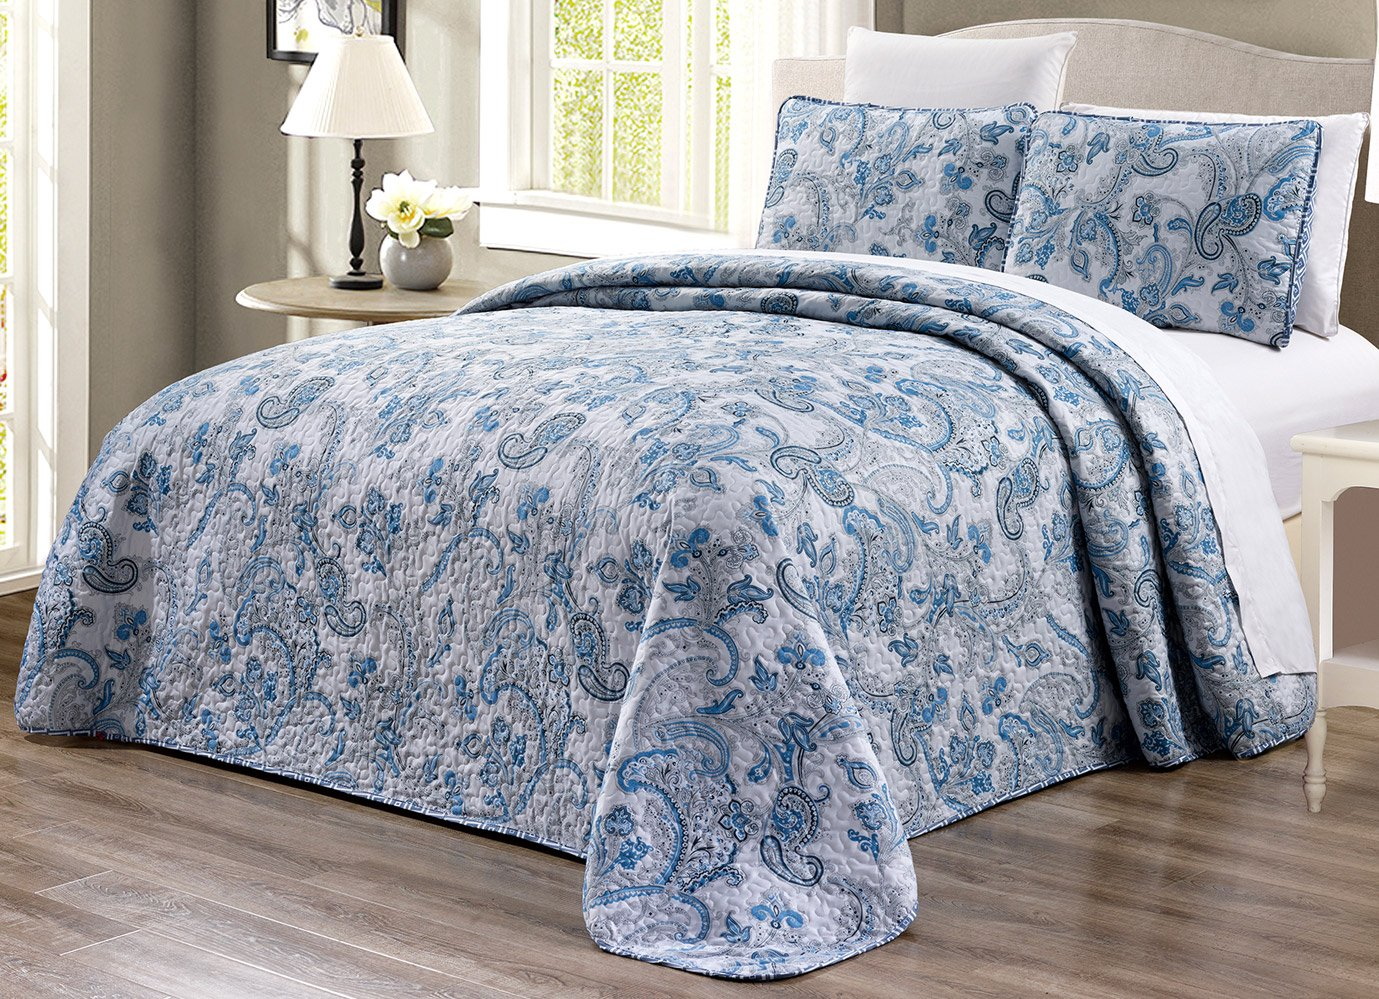 Coverlet BLACK Dobby Stripe Quilt Set Reversible Bedspread KING SIZE Bed Cover